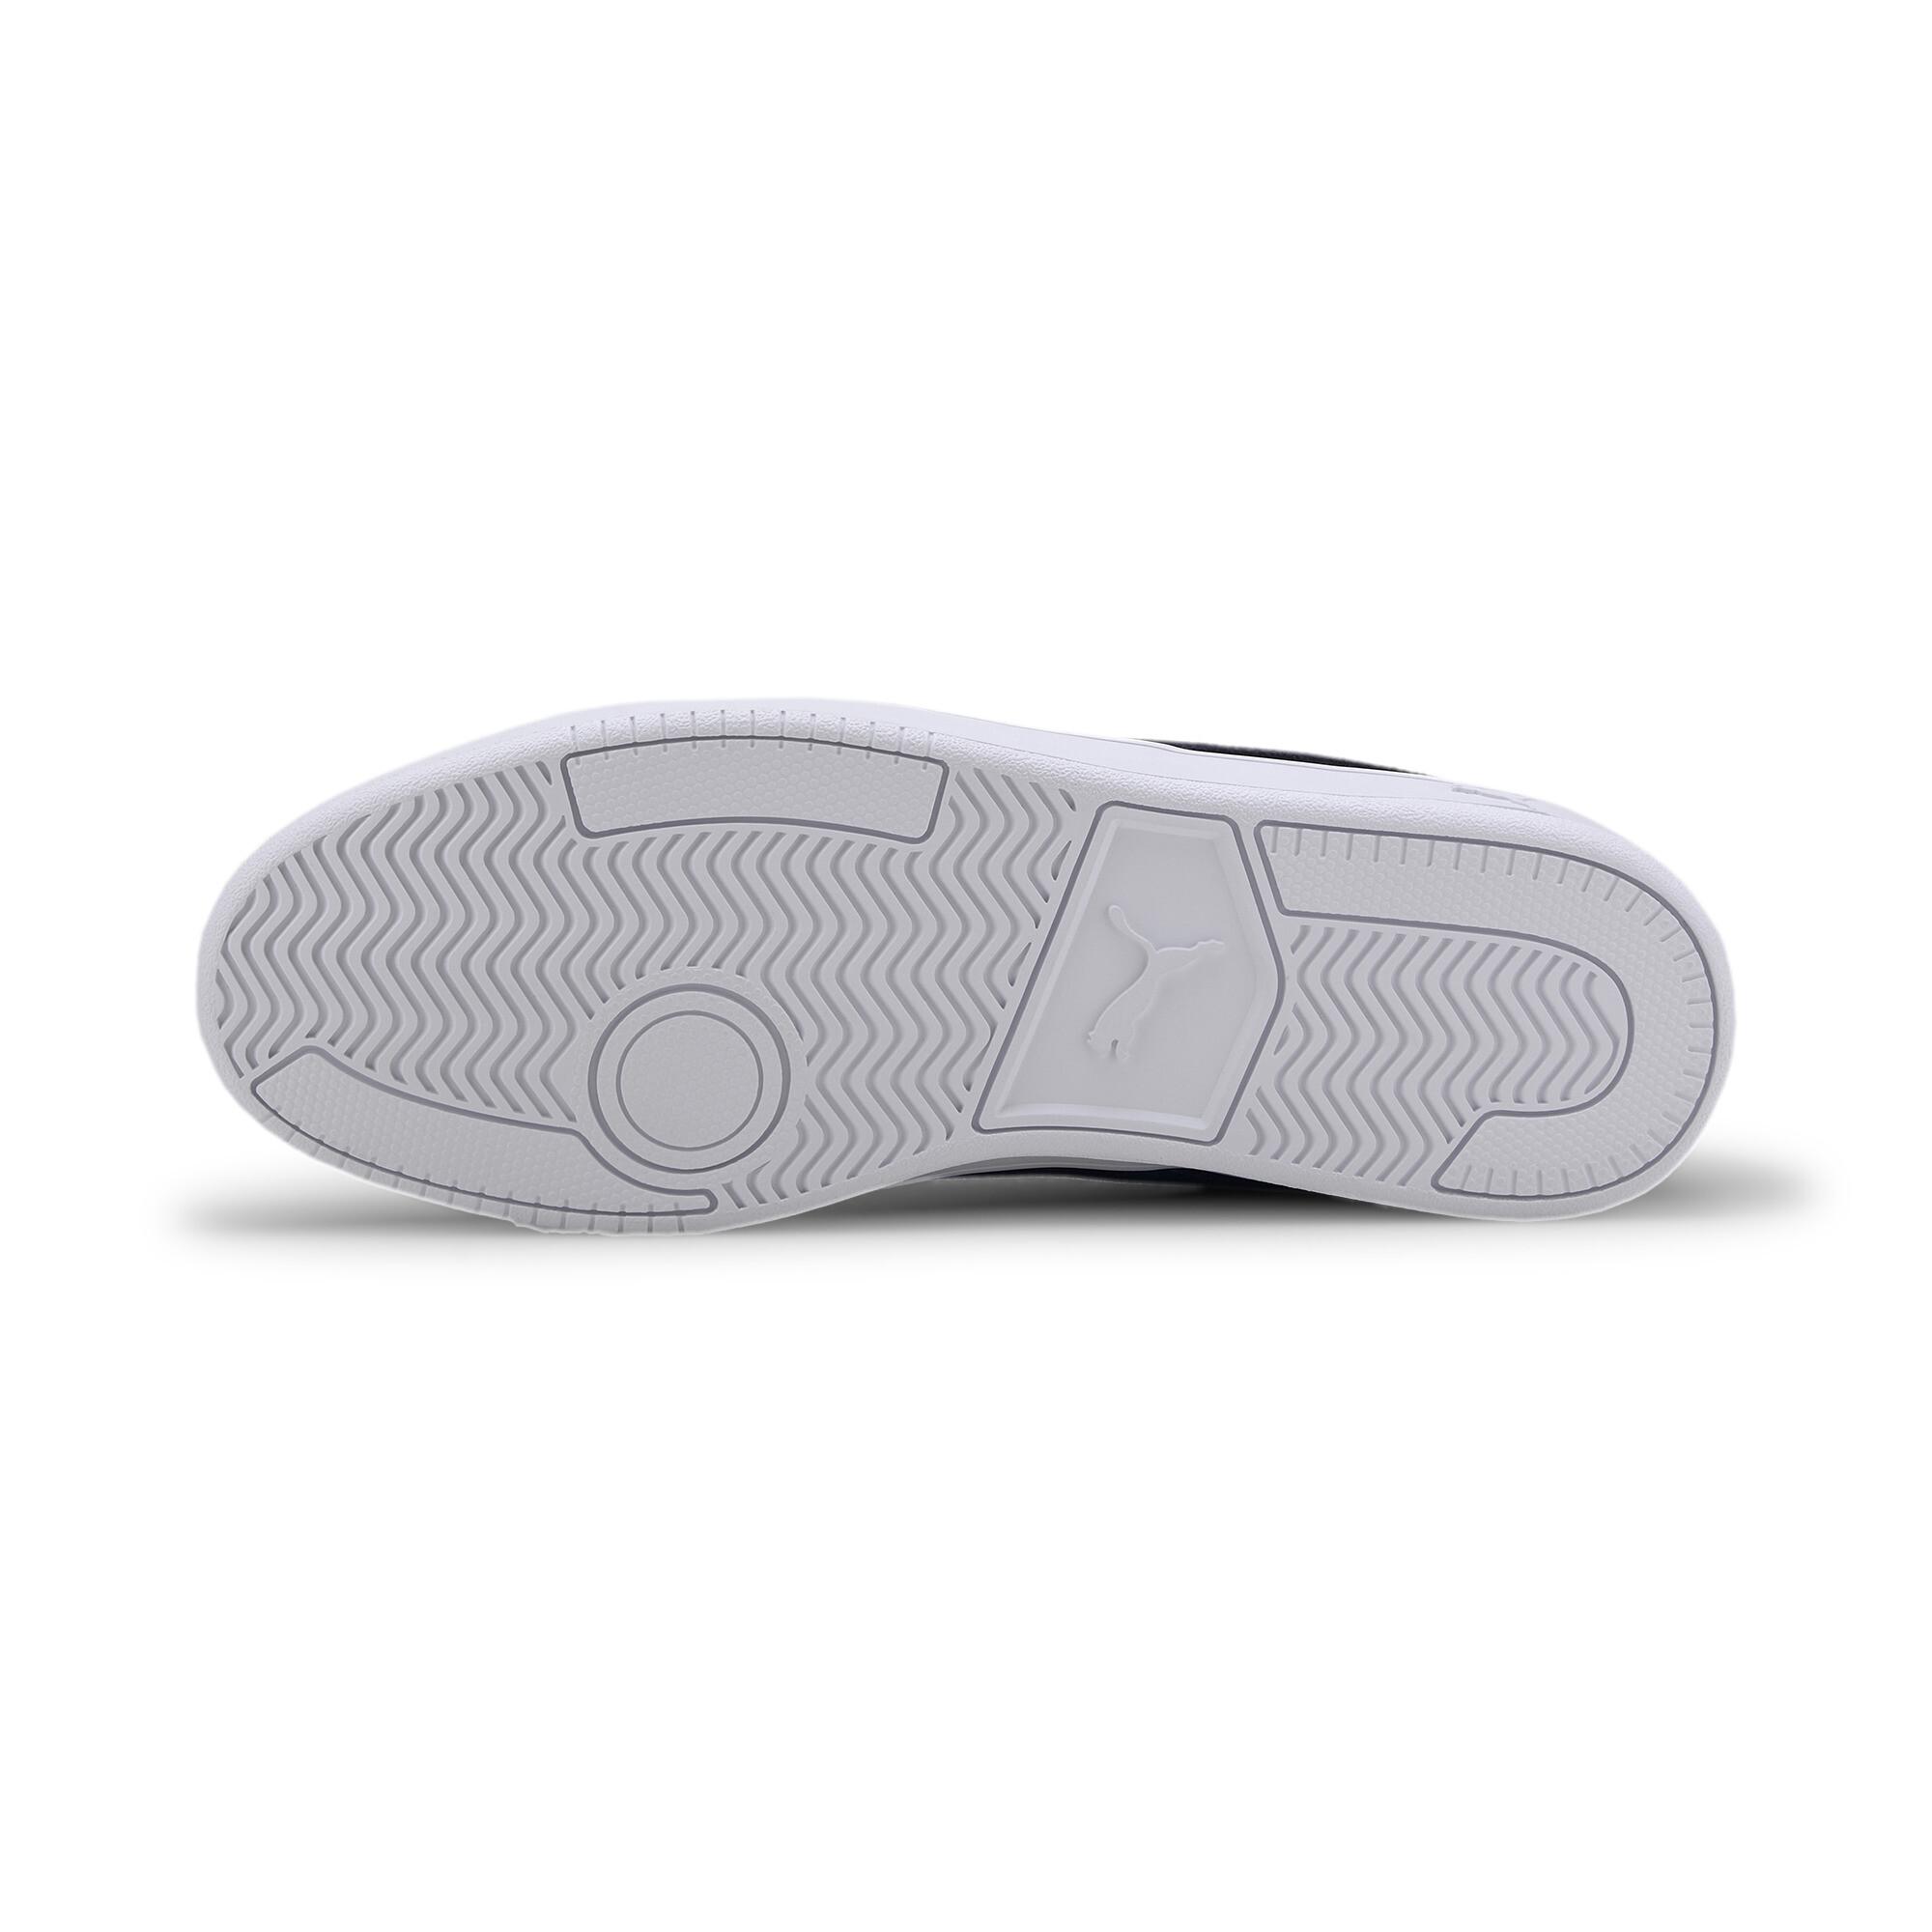 Indexbild 18 - PUMA Court Legend Lo Sneaker Unisex Schuhe Basics Neu